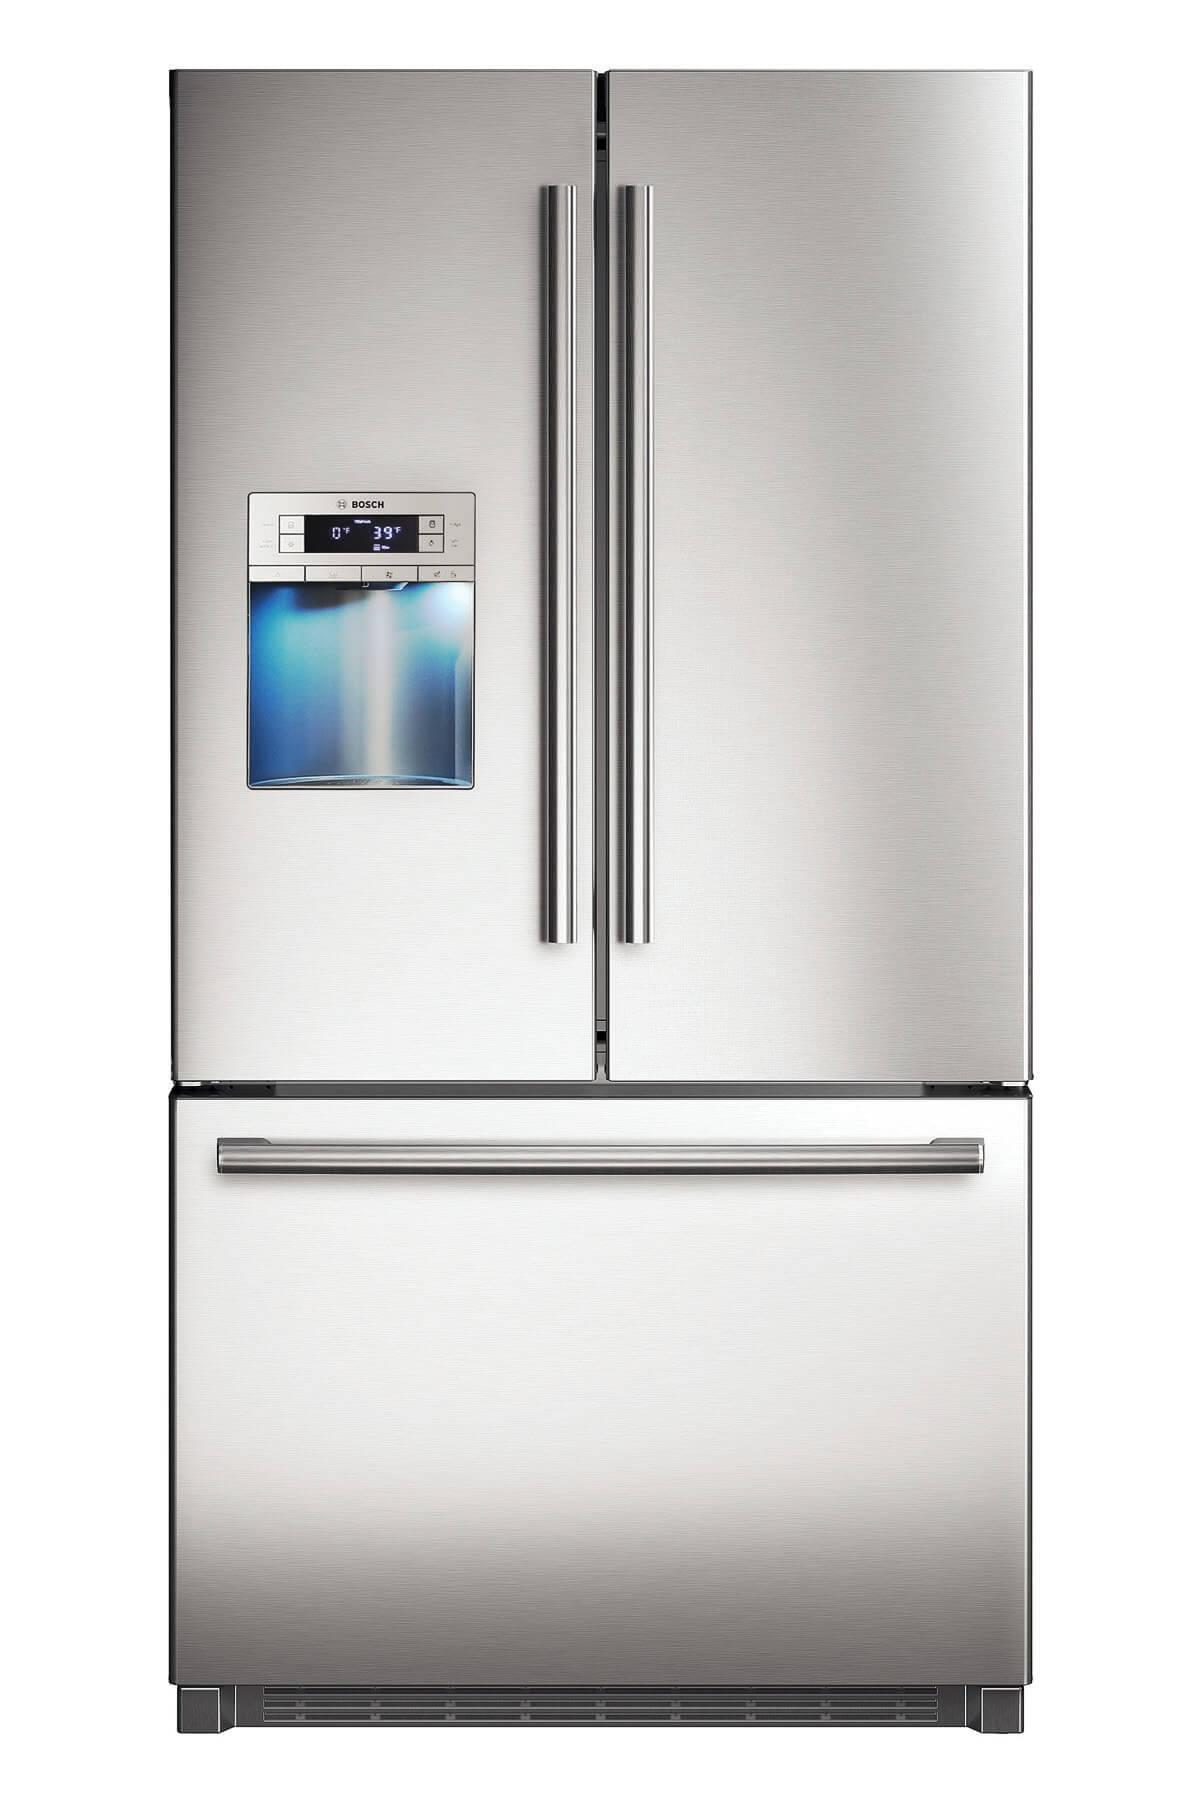 General Appliance Repair Bosch Refrigerator Repair San Fernando Valley Service Masters